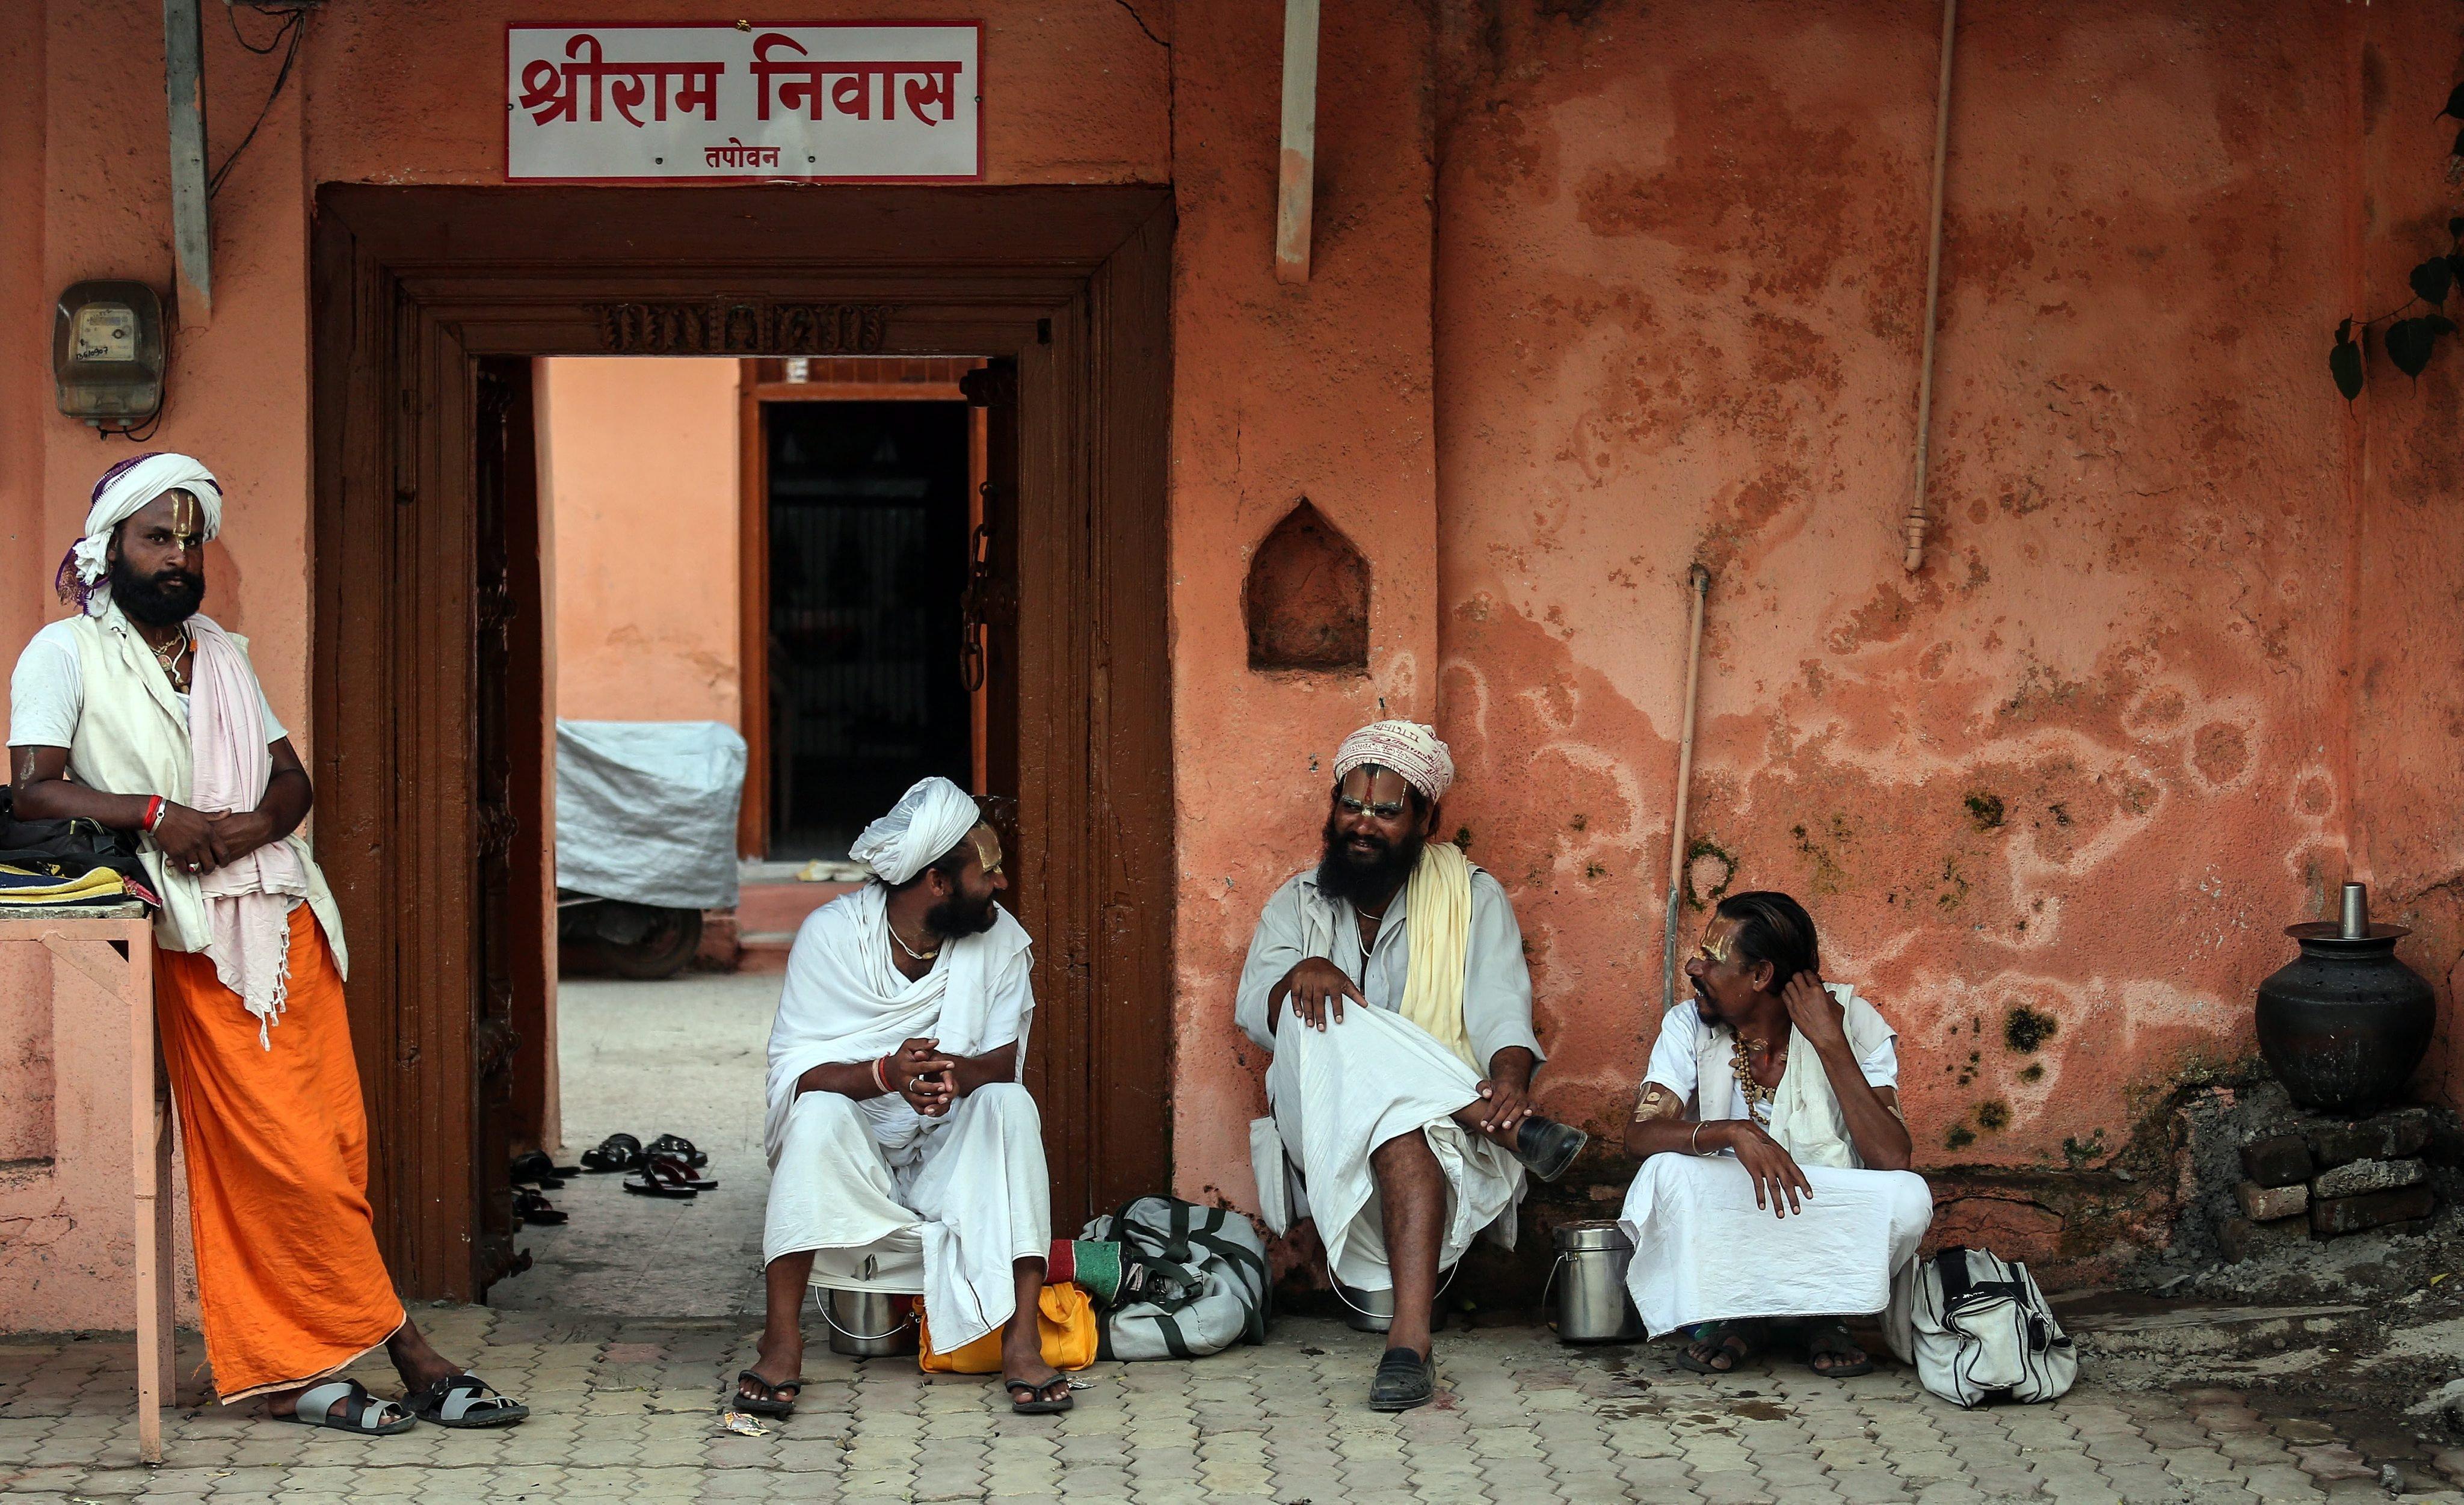 Indian sadhu or holy men sit near the banks of Godavari river during the Kumbh Mela festival in Nasik, India, on Aug. 28, 2015.